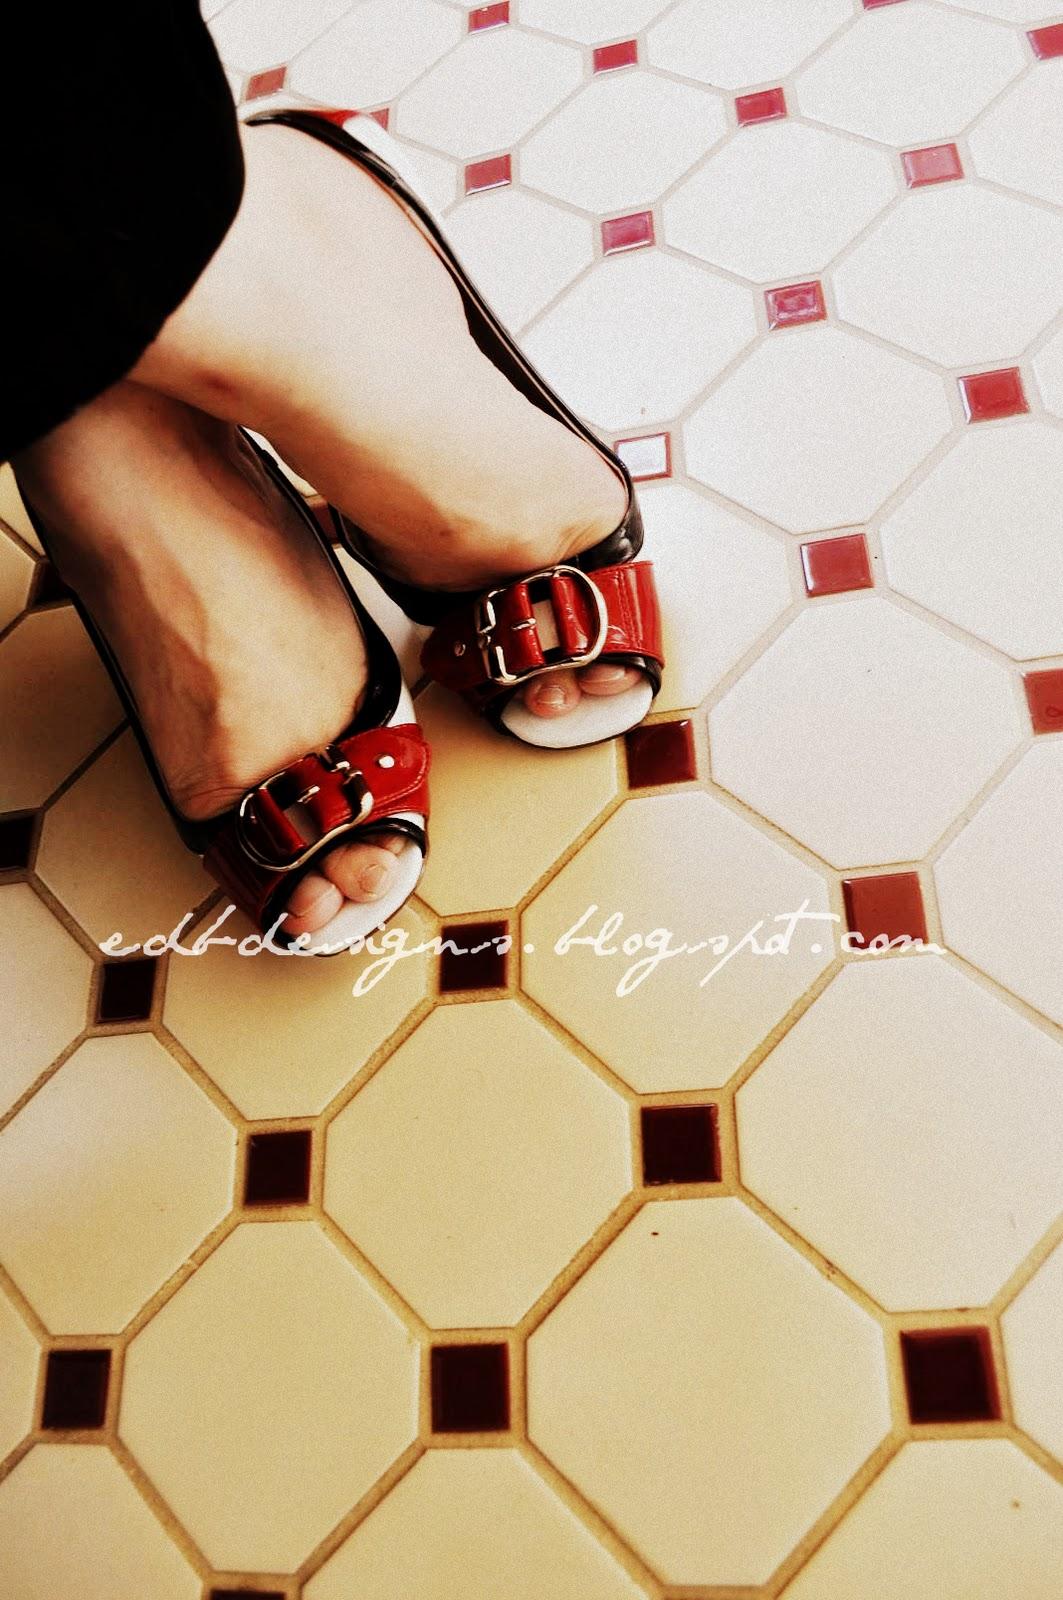 Sussana Reid Open Legs Pics Femjoy Sussan Free Pics